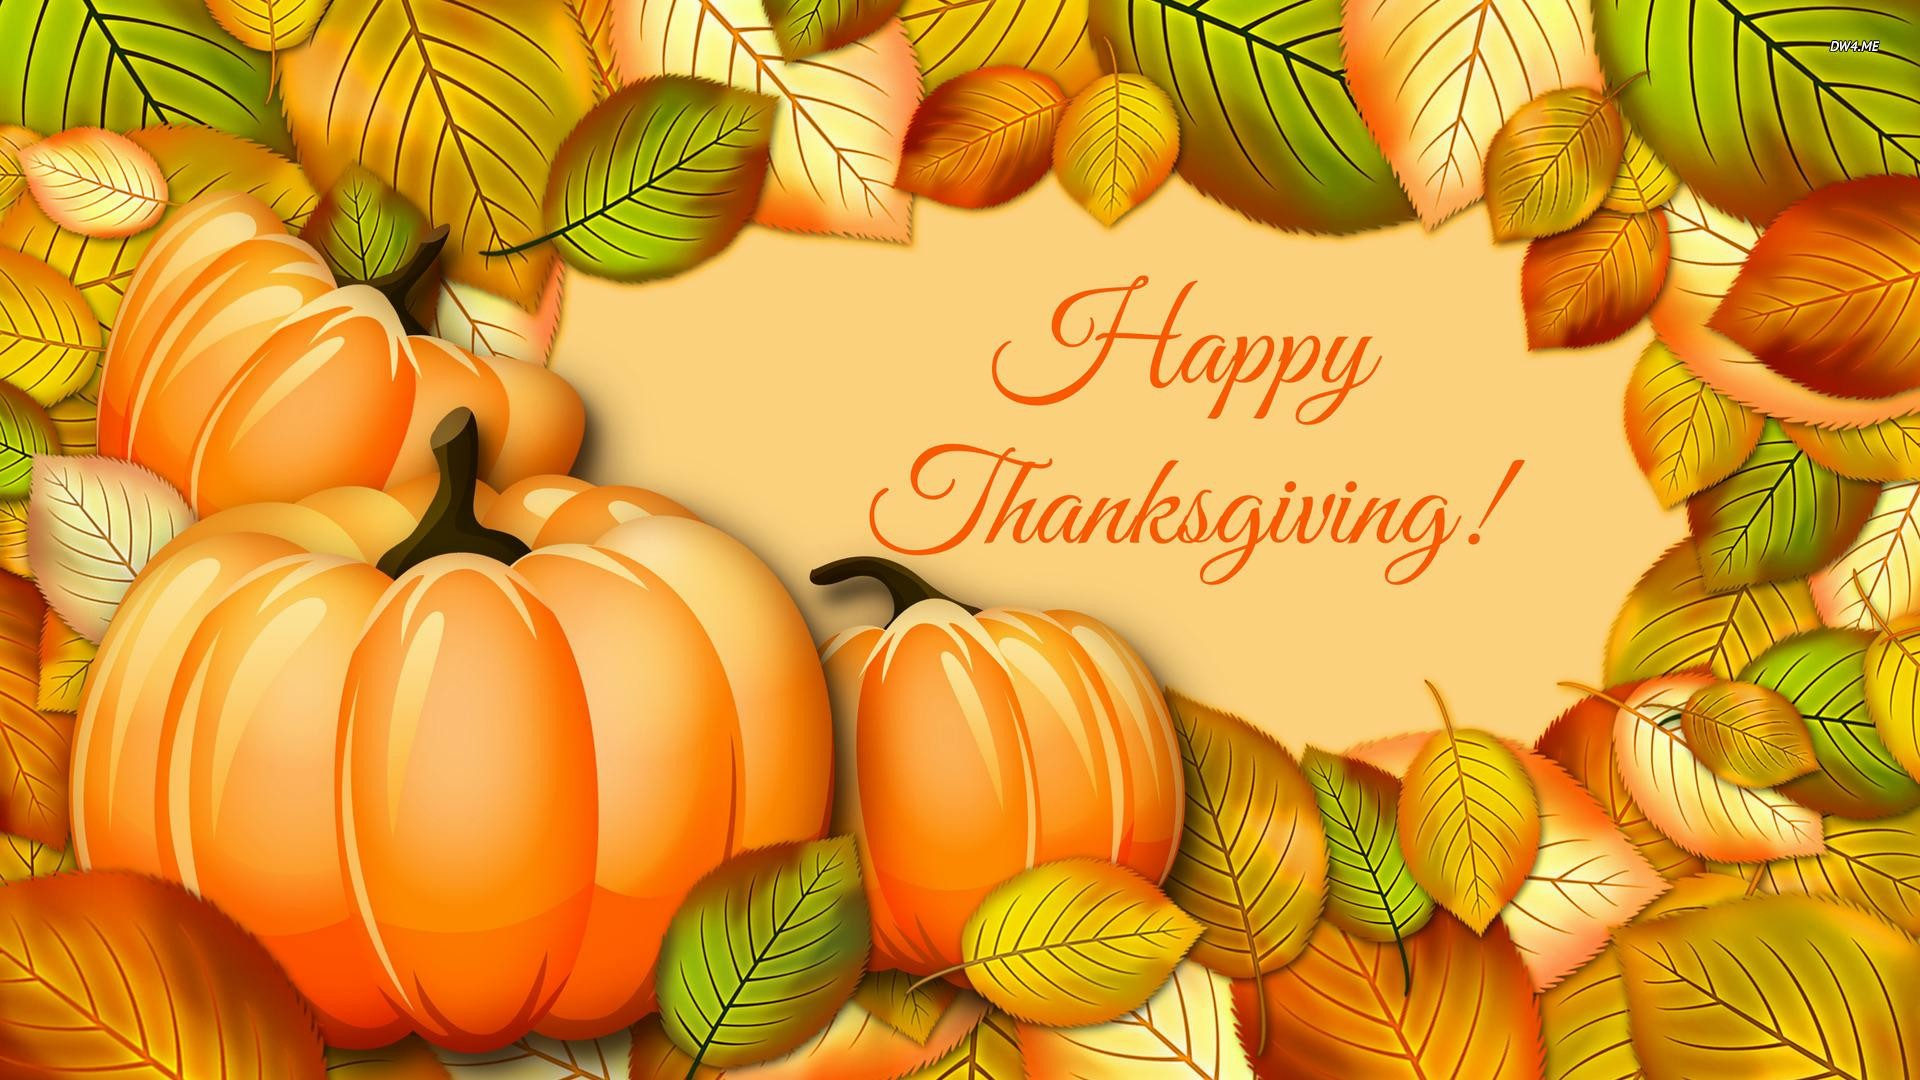 free-happy-thanksgiving-1920%C3%971080-wallpaper-wpt7204741